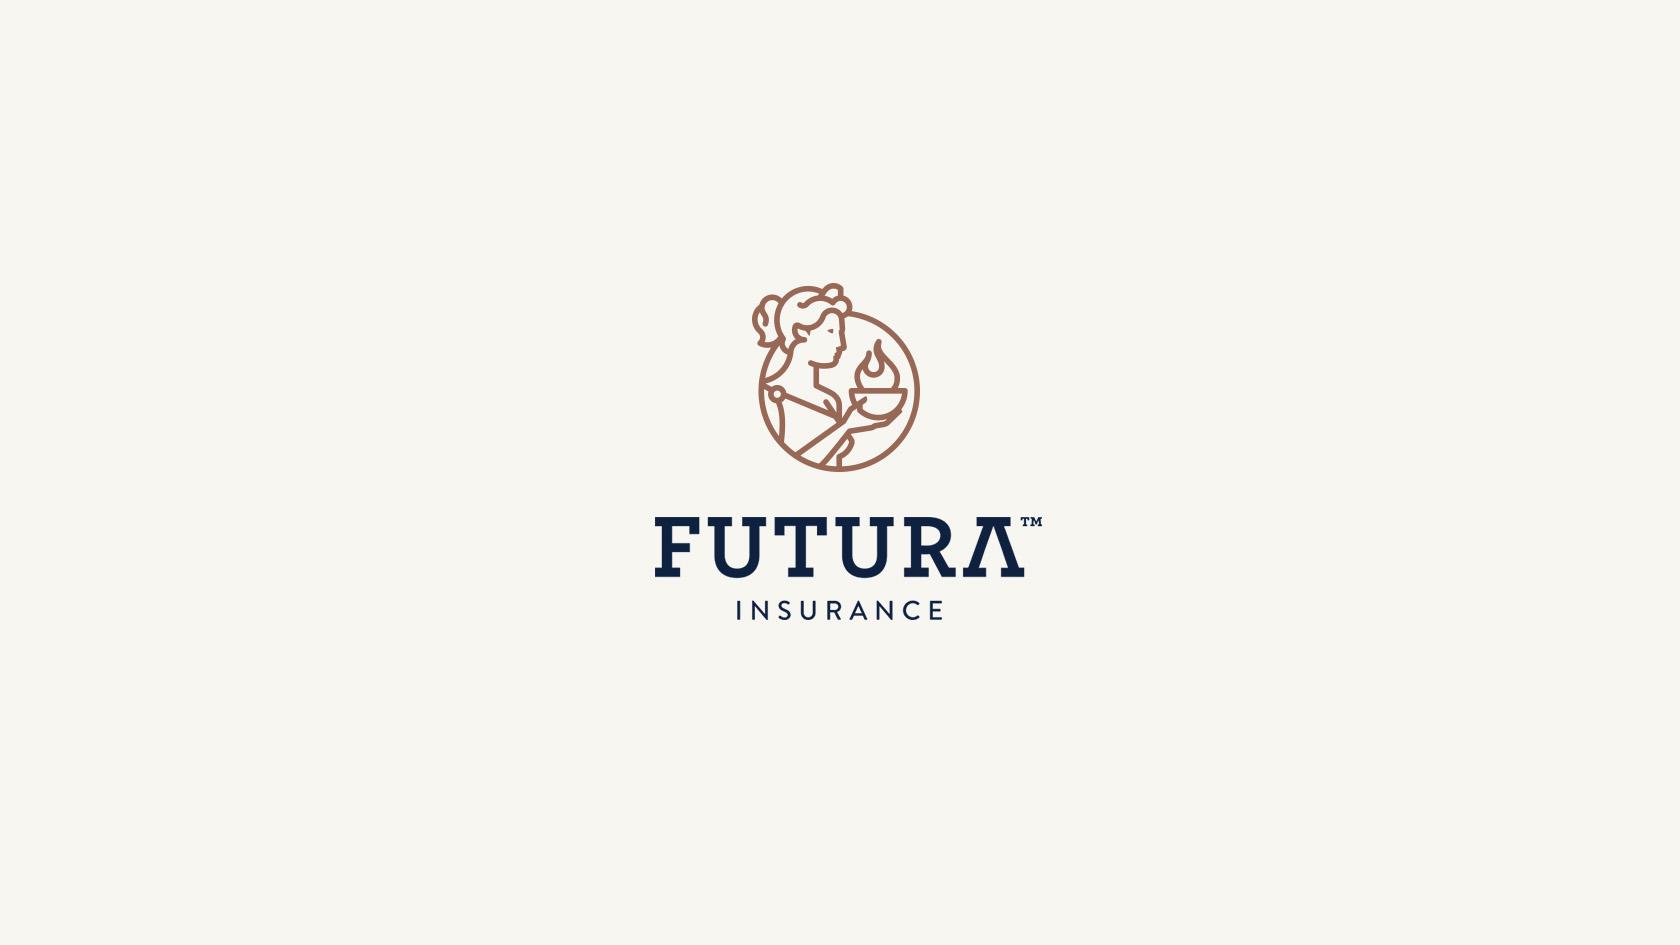 Futura_Presentacion2b